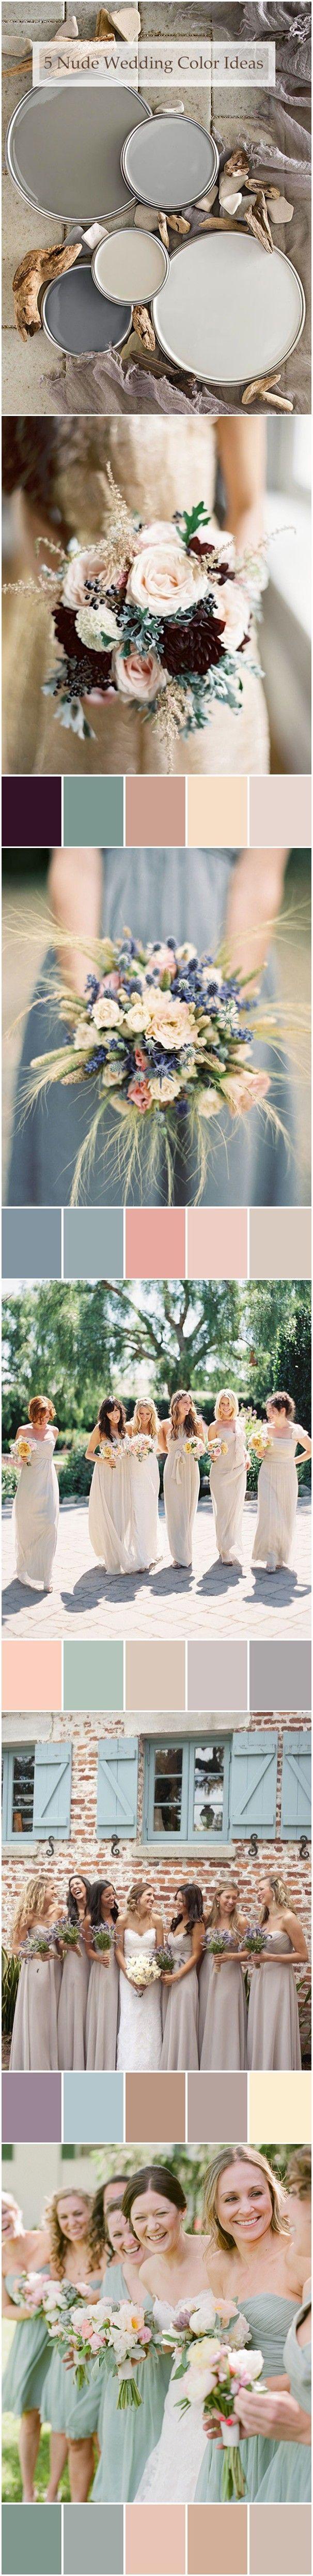 top 6 trending nude neutral wedding color ideas #weddingcolors #weddingideas